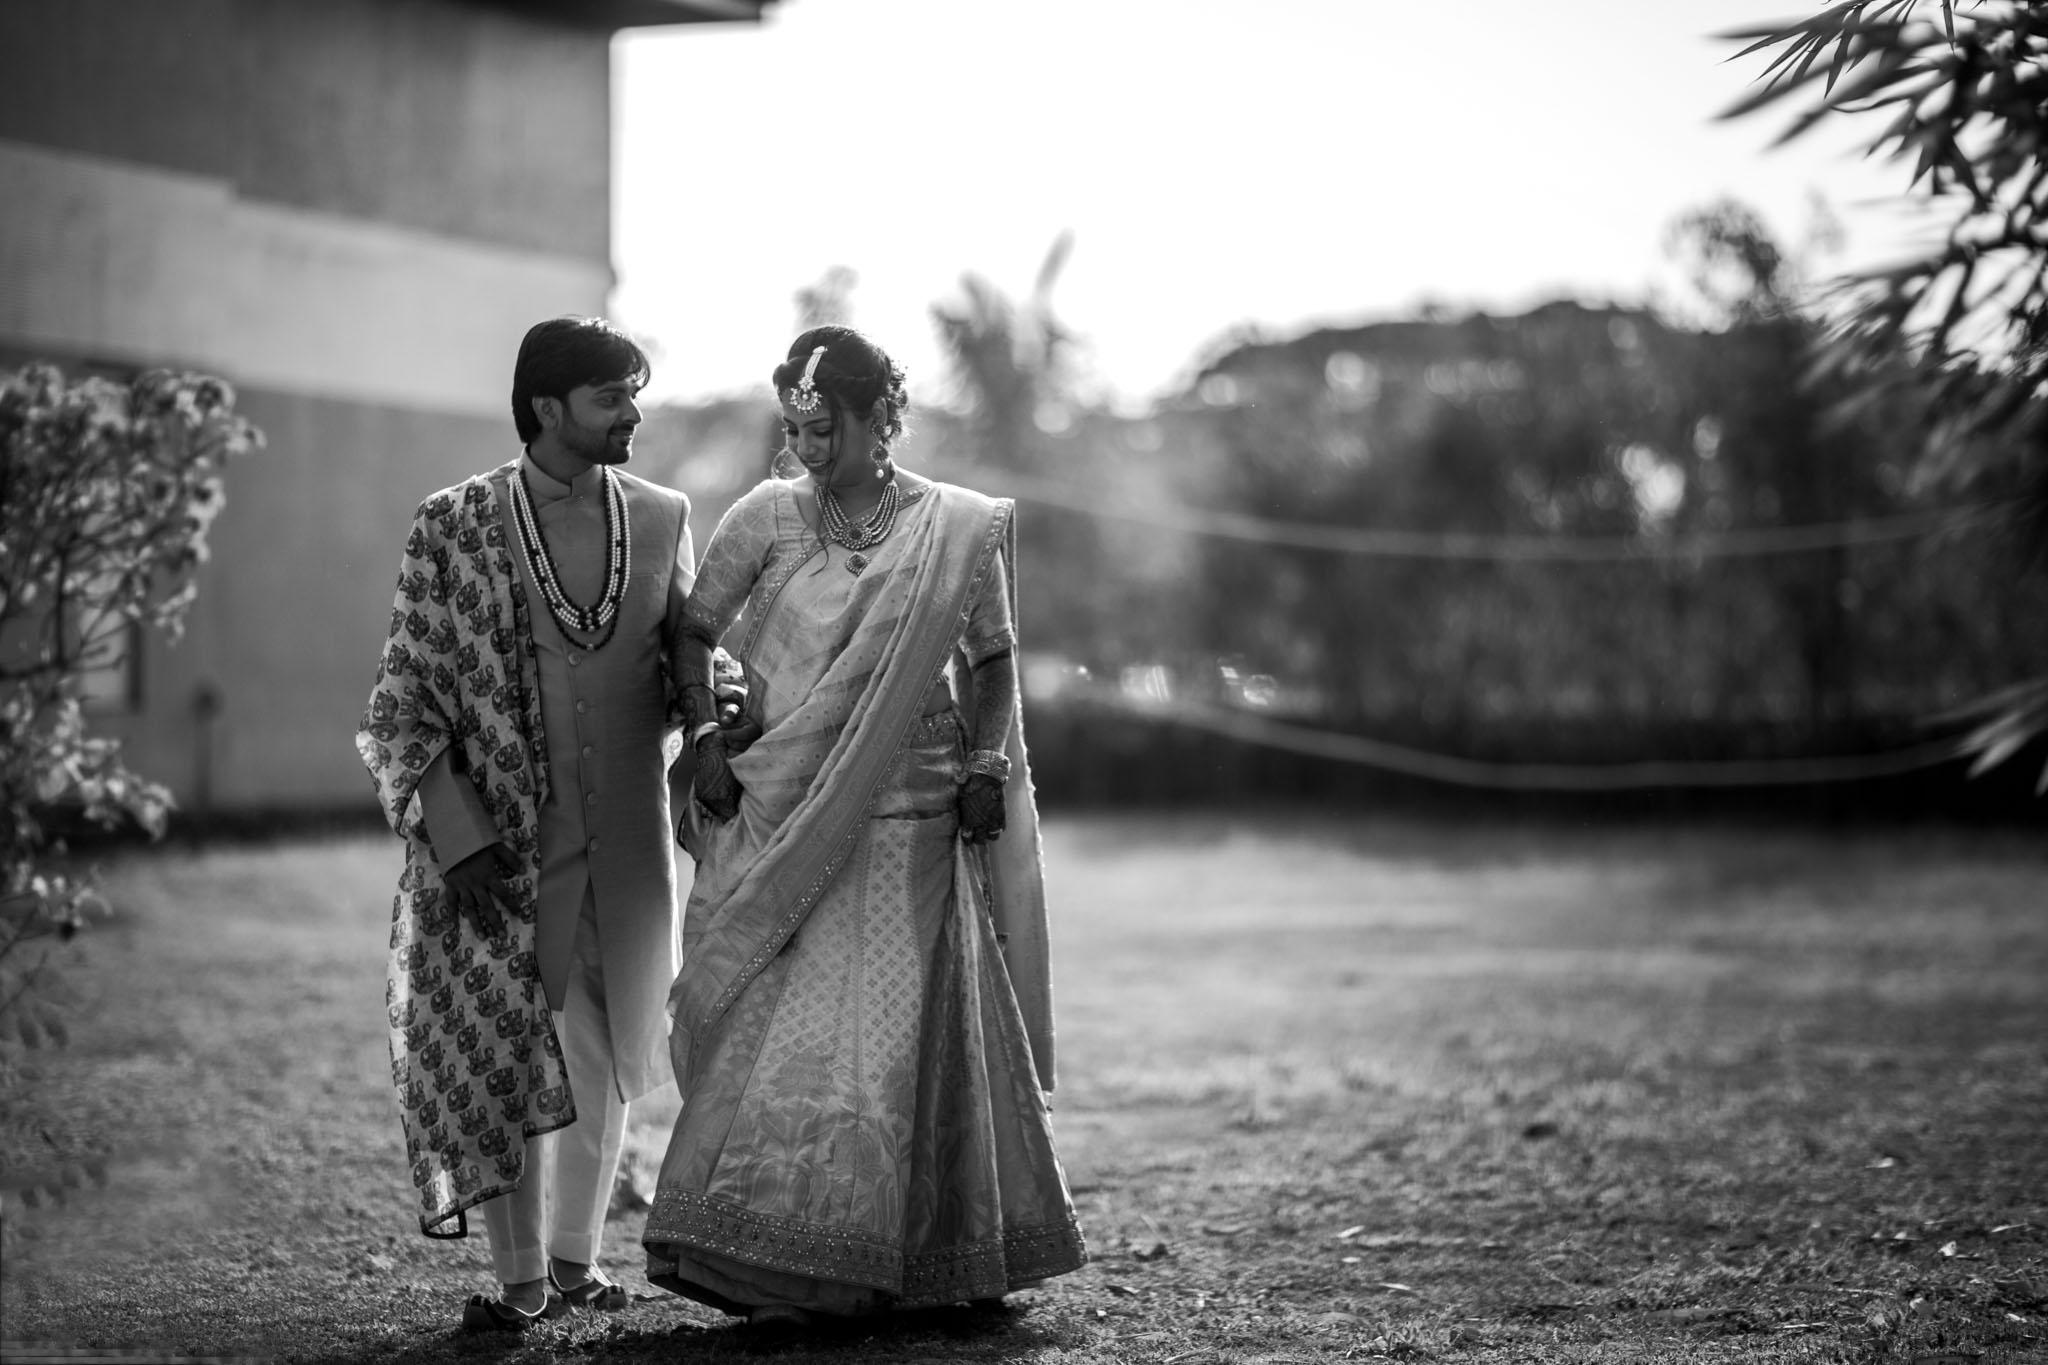 Mukti x Ojas Wedding Akshjay Sansare Photography Best wedding photographer in mumbai India Candid Cinematic Films videos-14.jpg